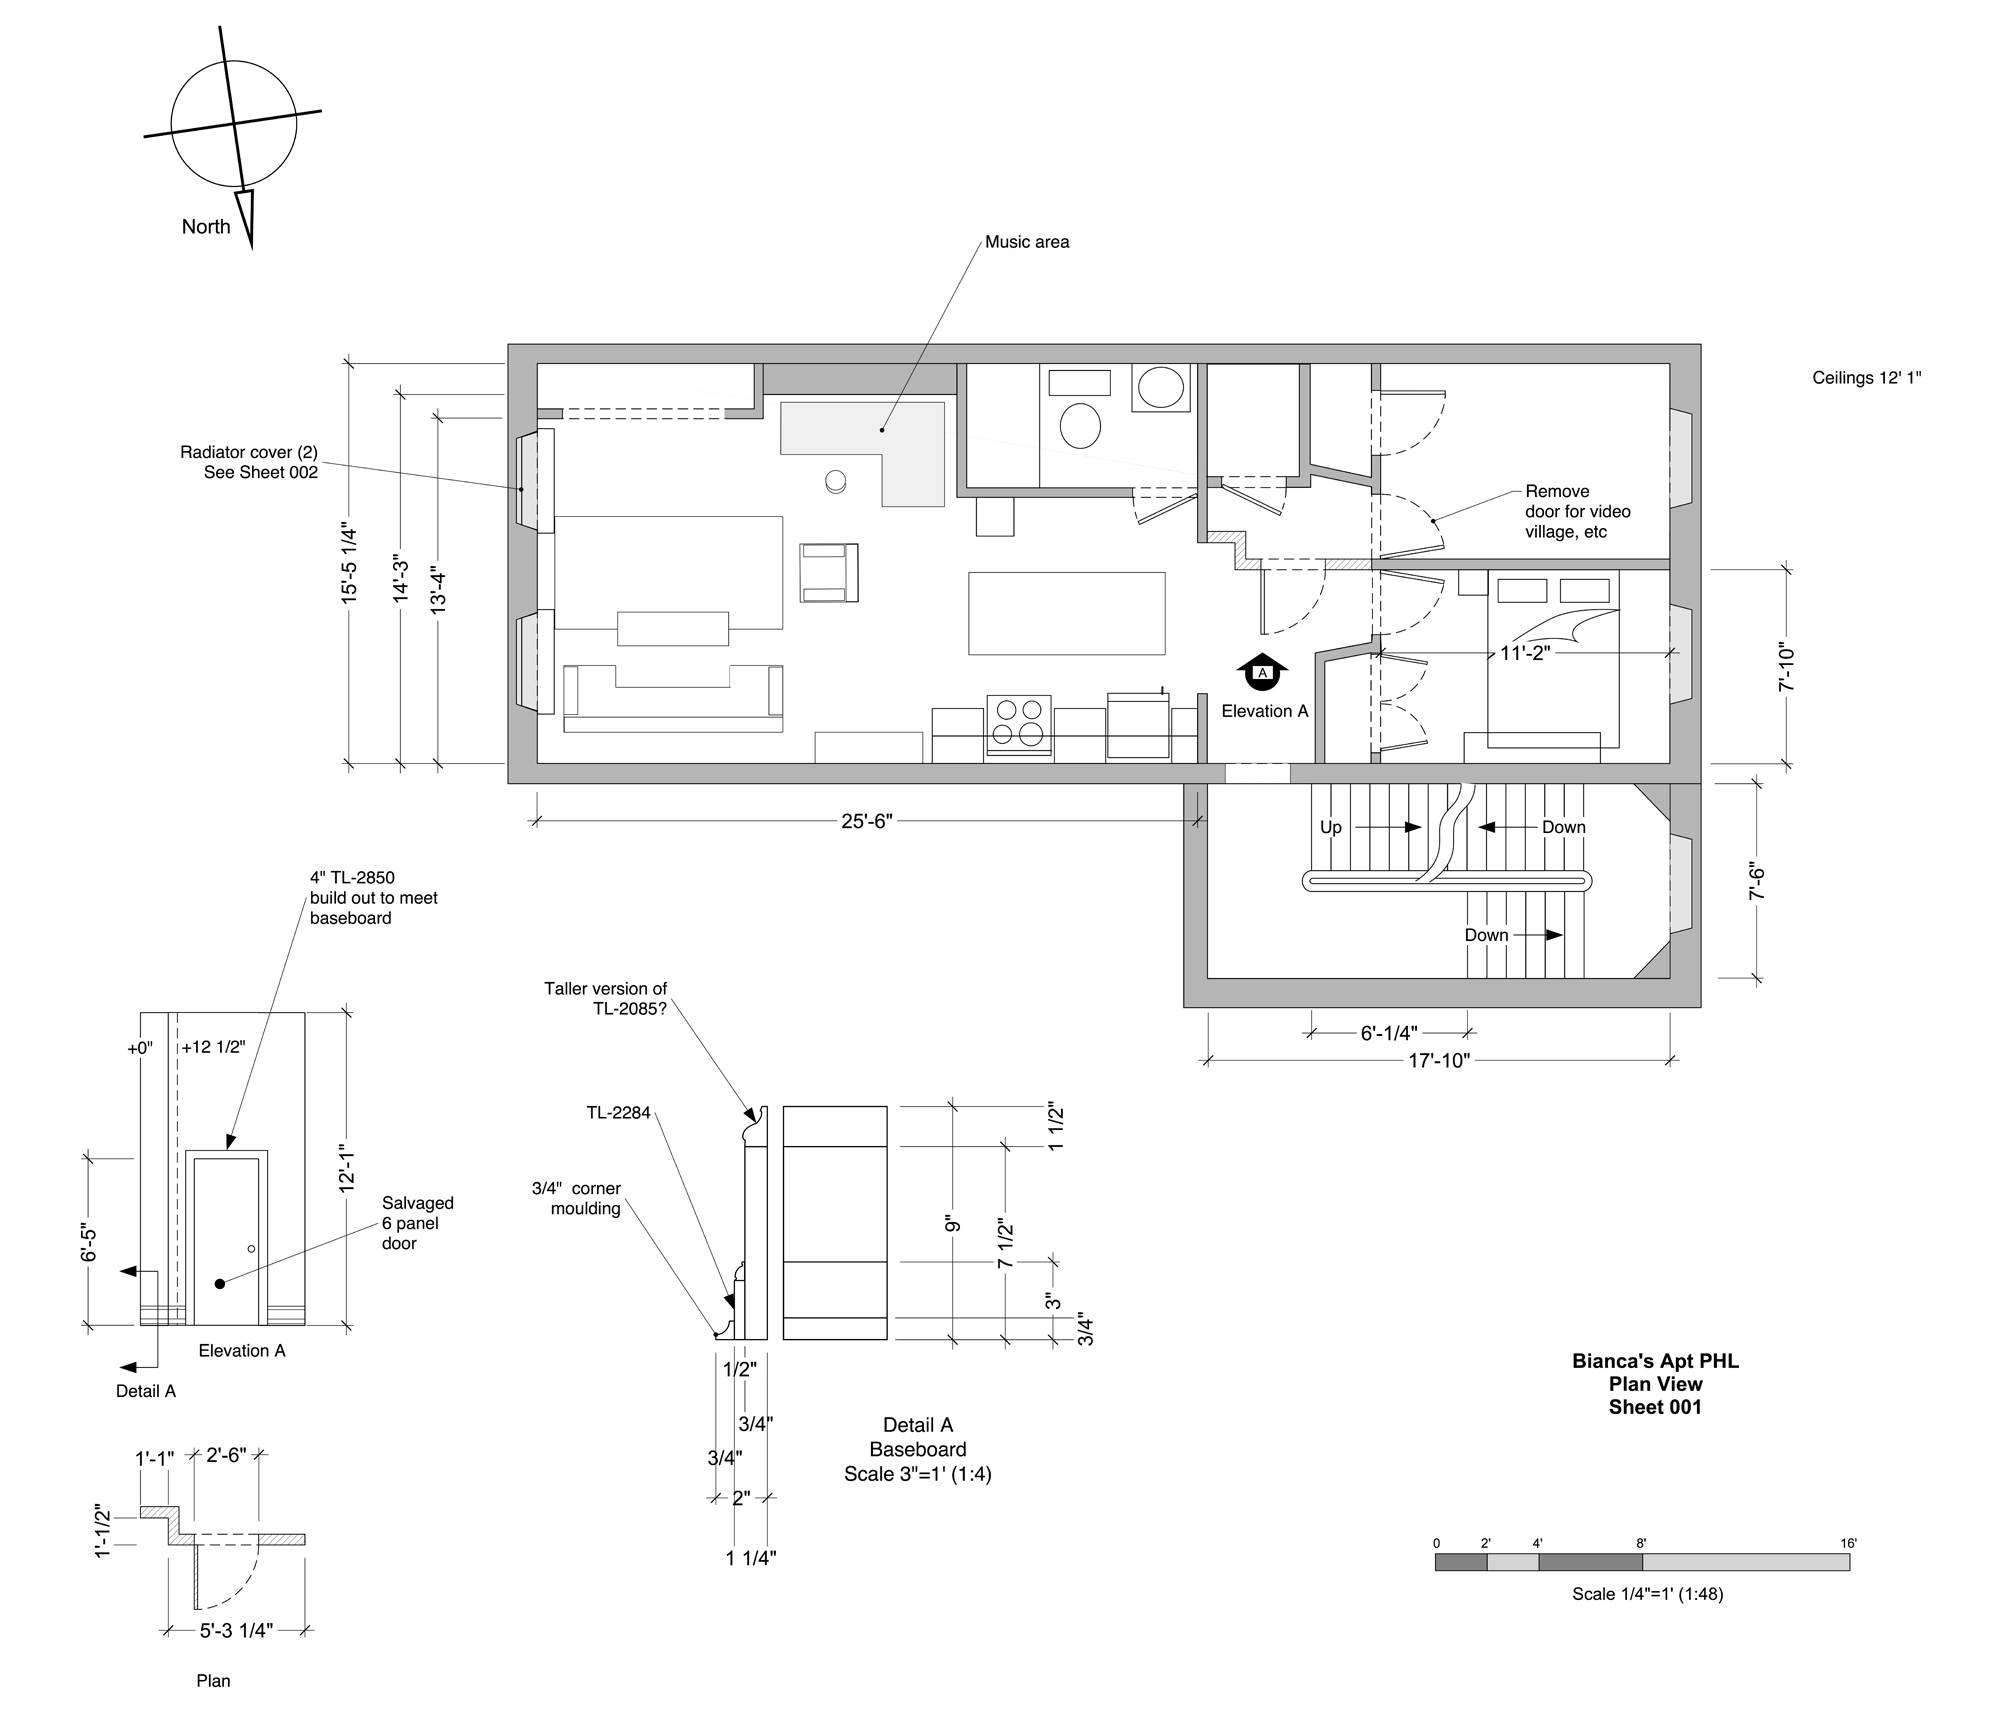 Bianca's Apartment Floor Plan